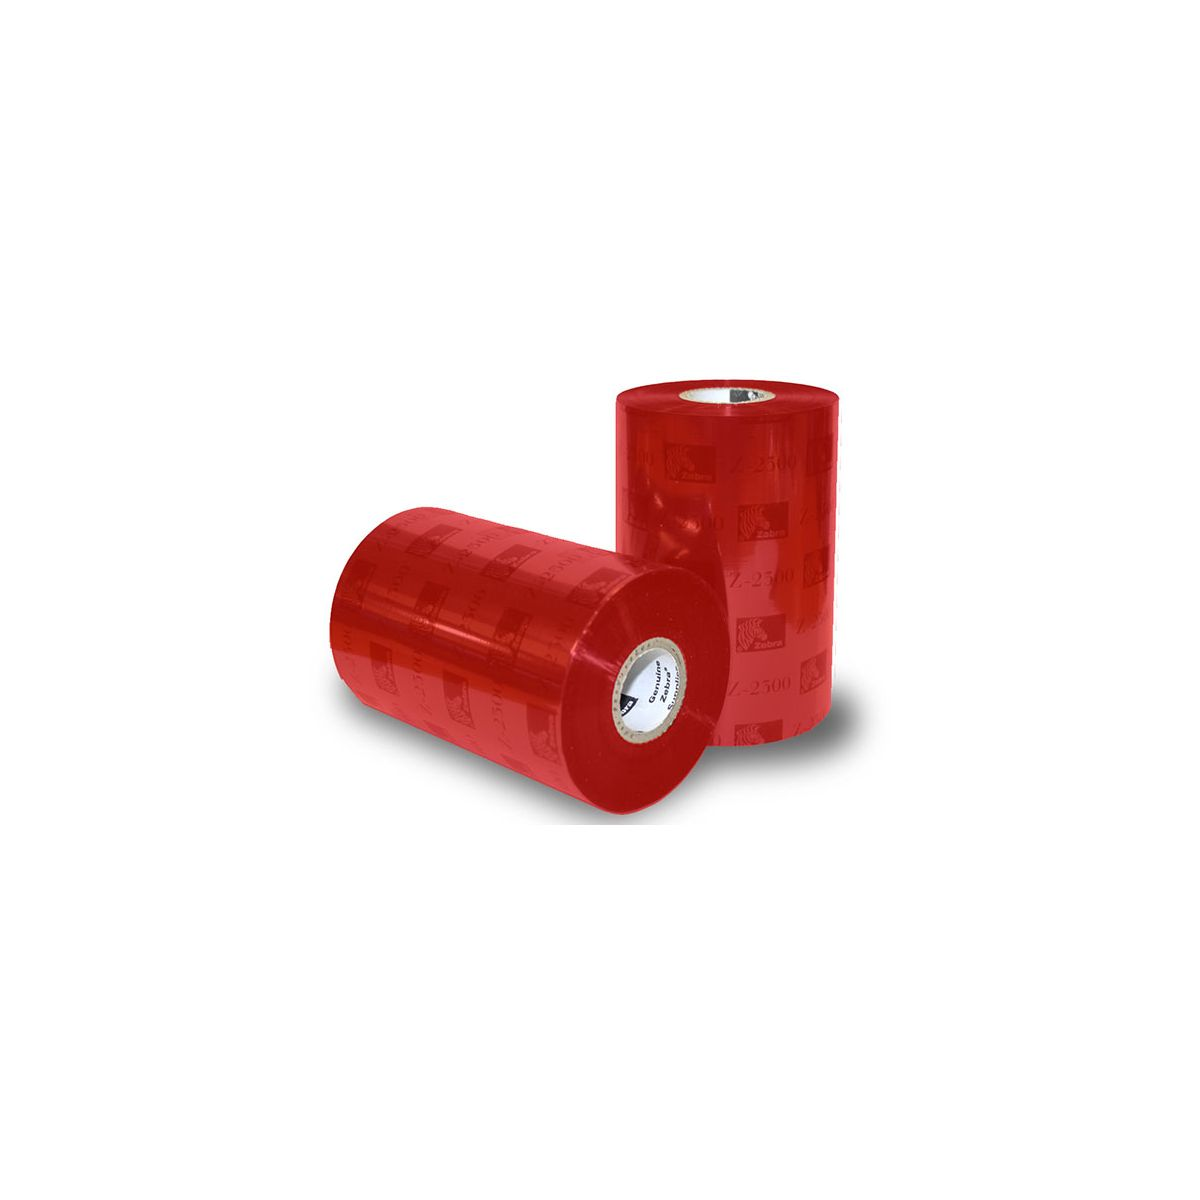 Rollo de Ribbon Zebra 110mm 5319 Colour Red Performance Cera 450M para Impresoras Industriales